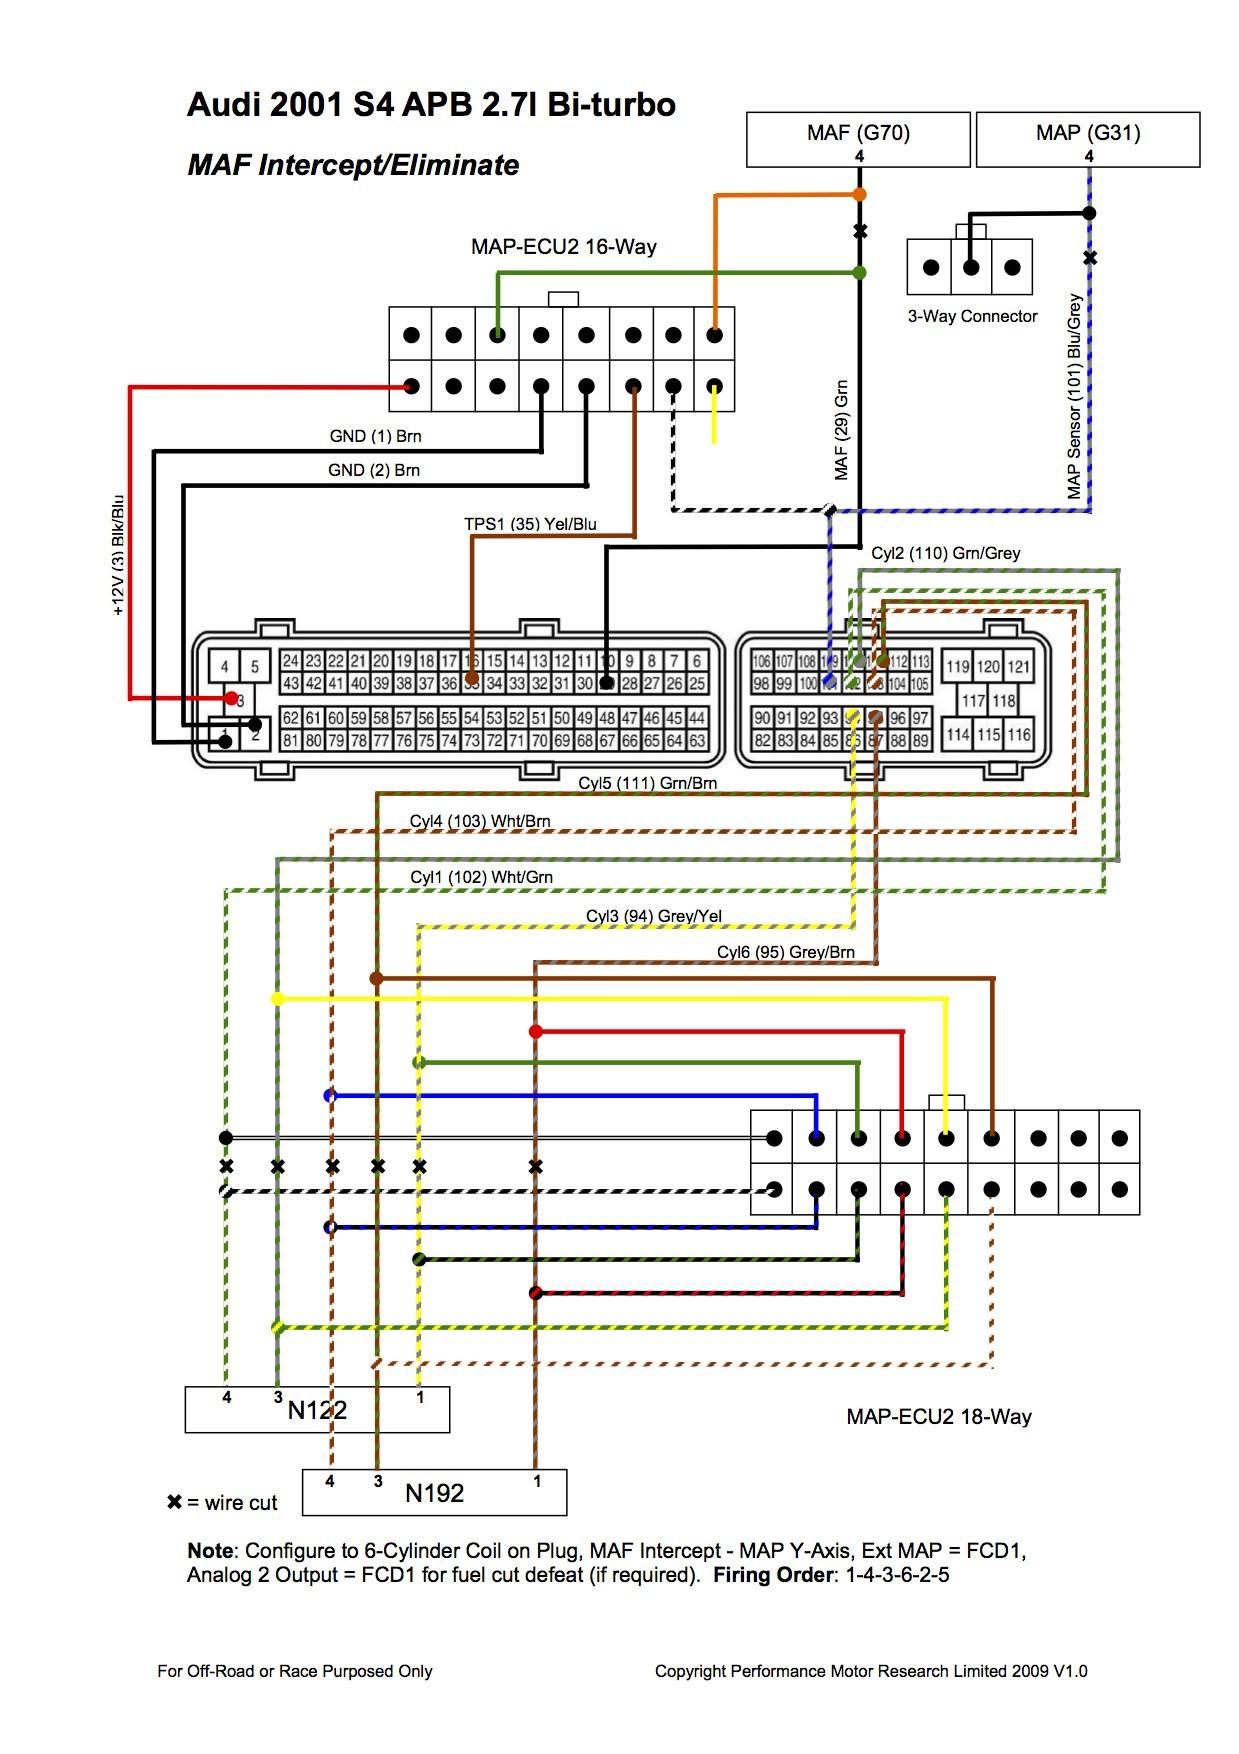 Wiring Diagram Deh X6600Bt | Wiring Diagram - Pioneer Deh X6600Bt Wiring Diagram